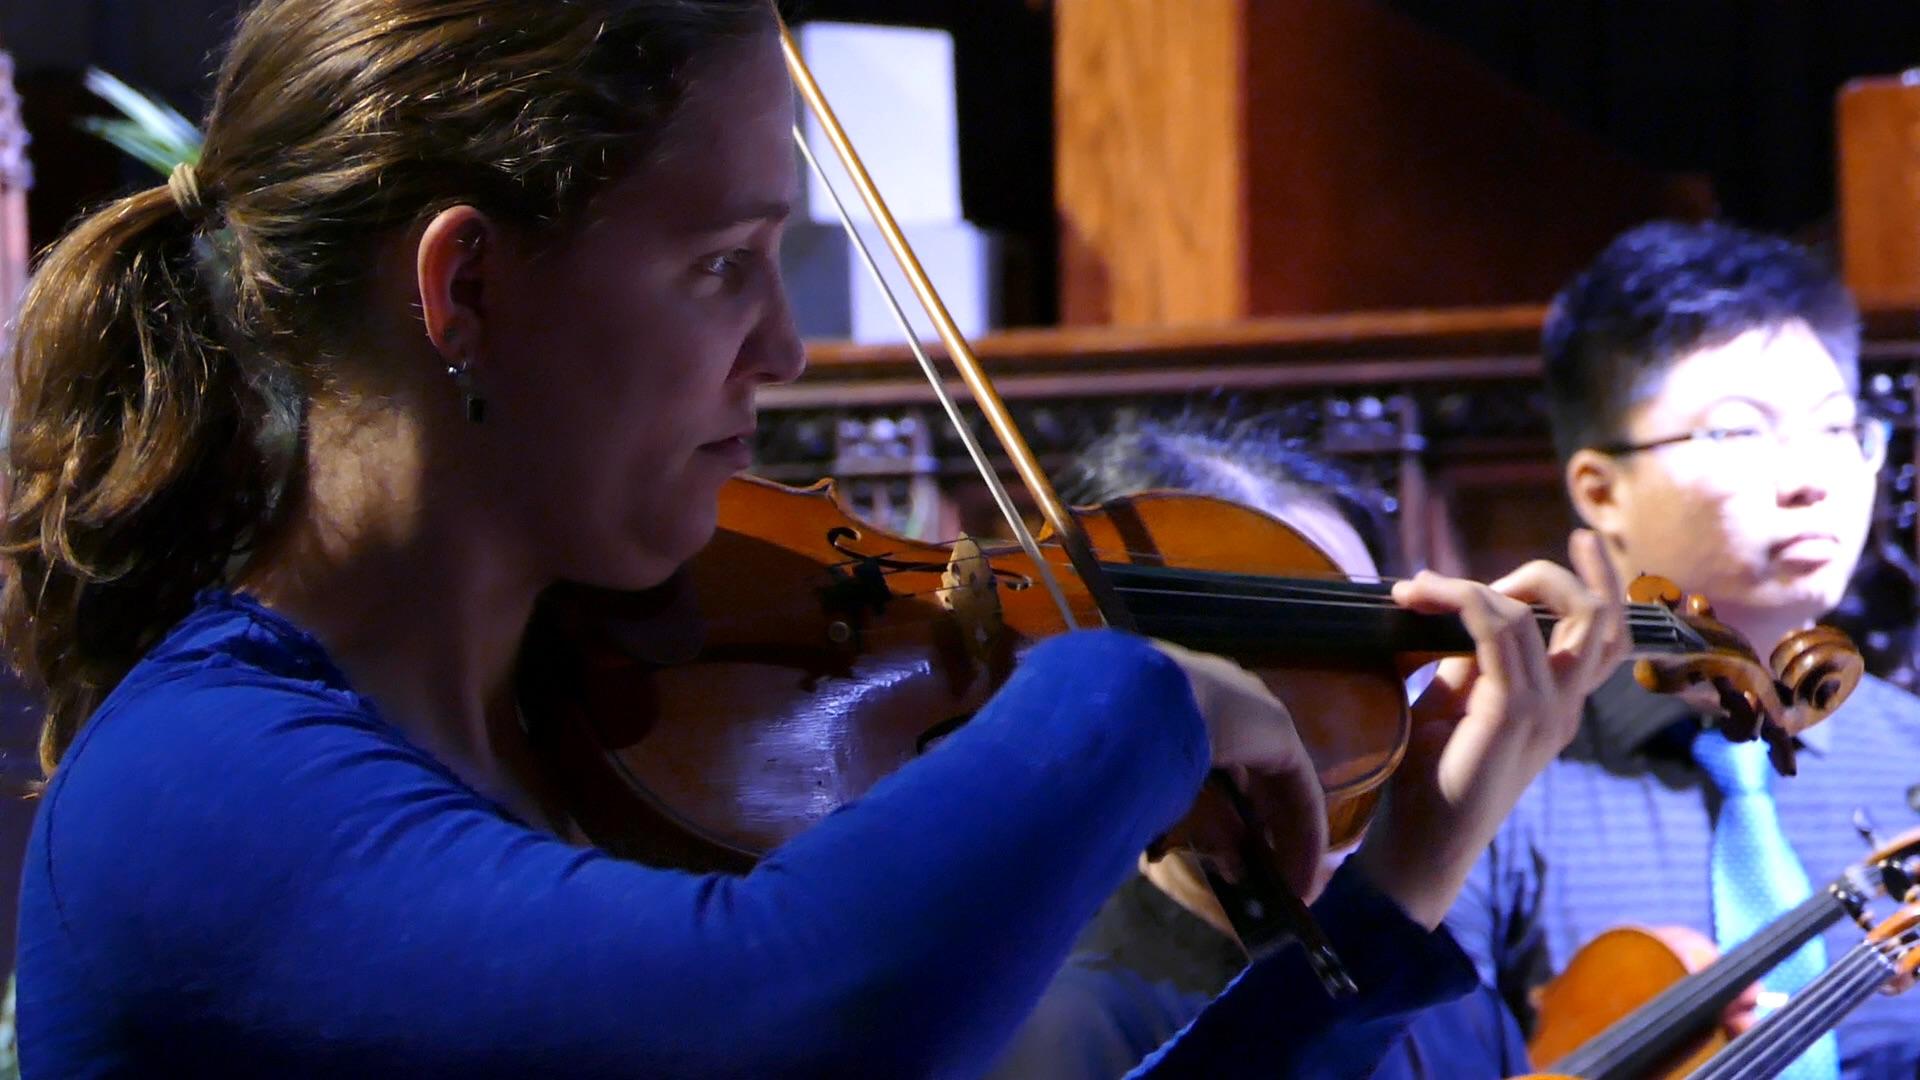 Former Associate Concertmaster Kristin Bakkegard leads the orchestra